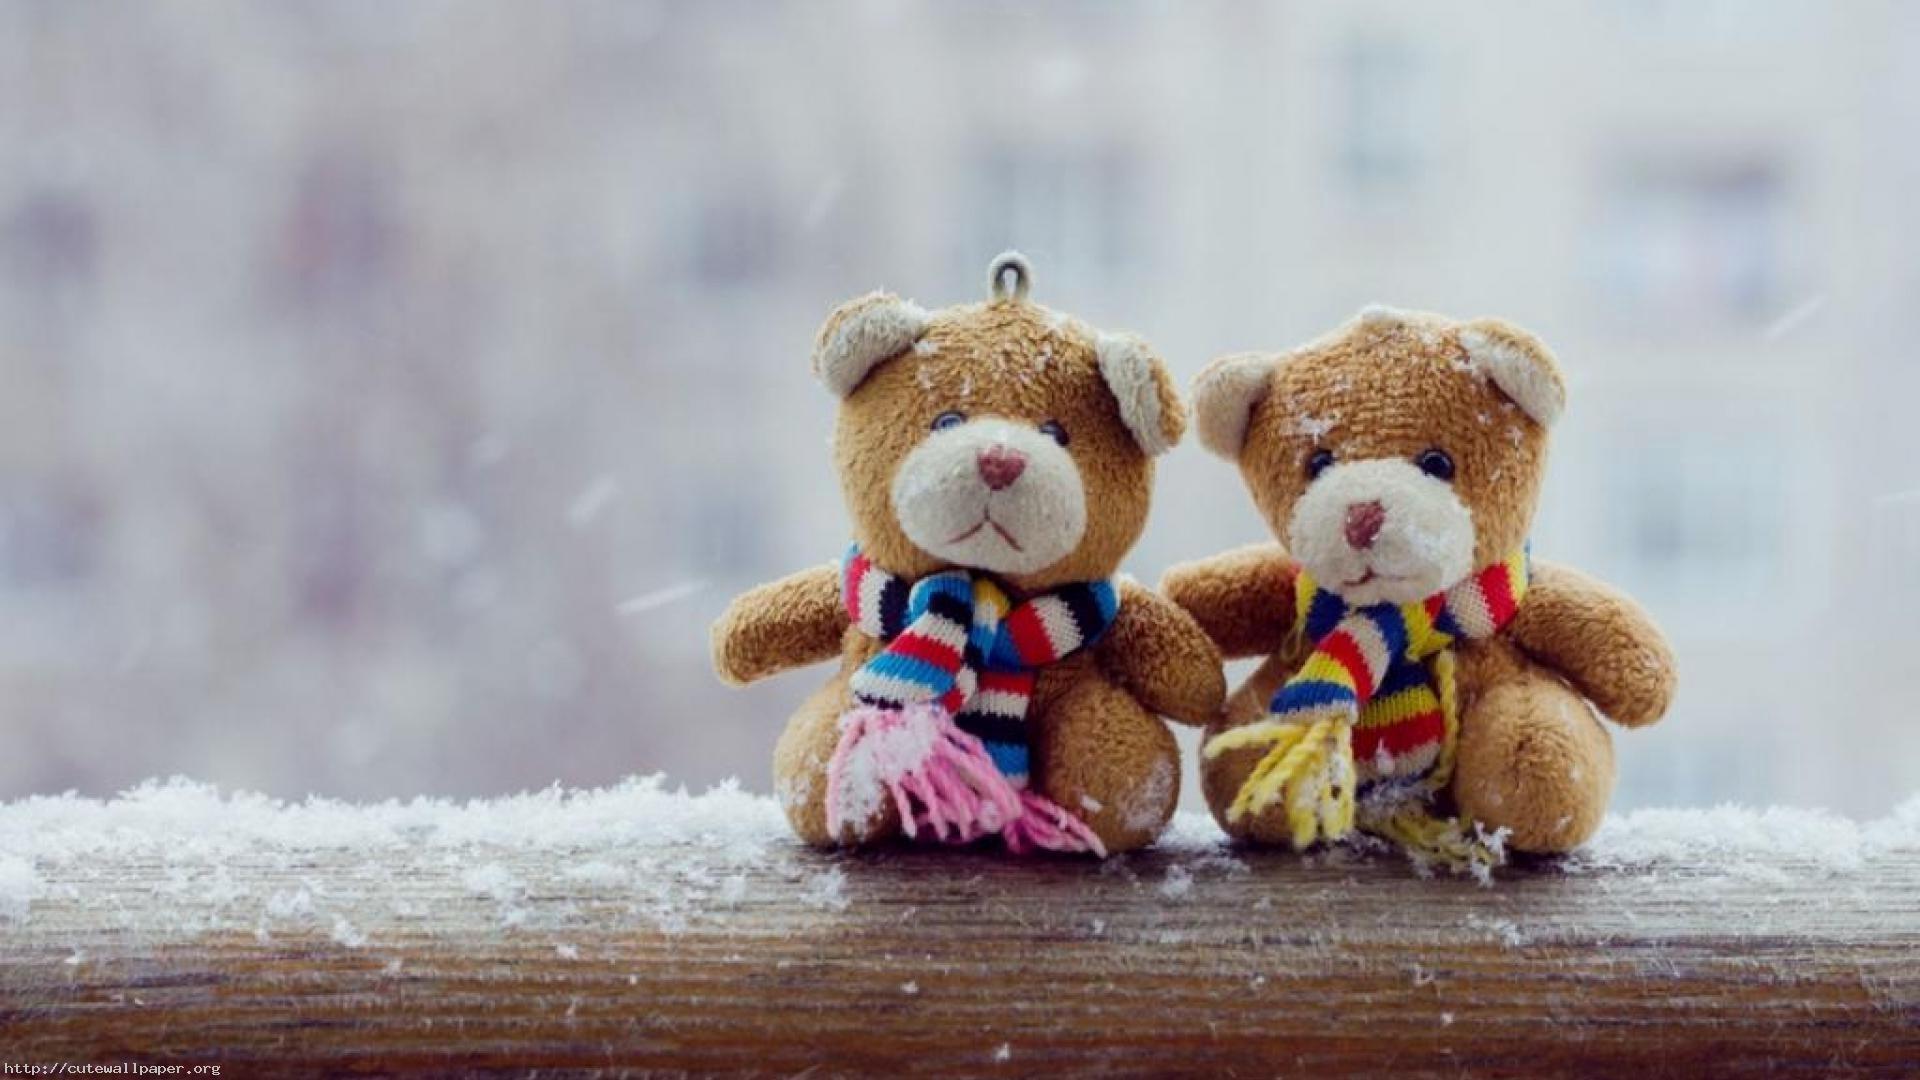 1920x1080 6. teddy-bear-wallpaper-free-Download6-600x338